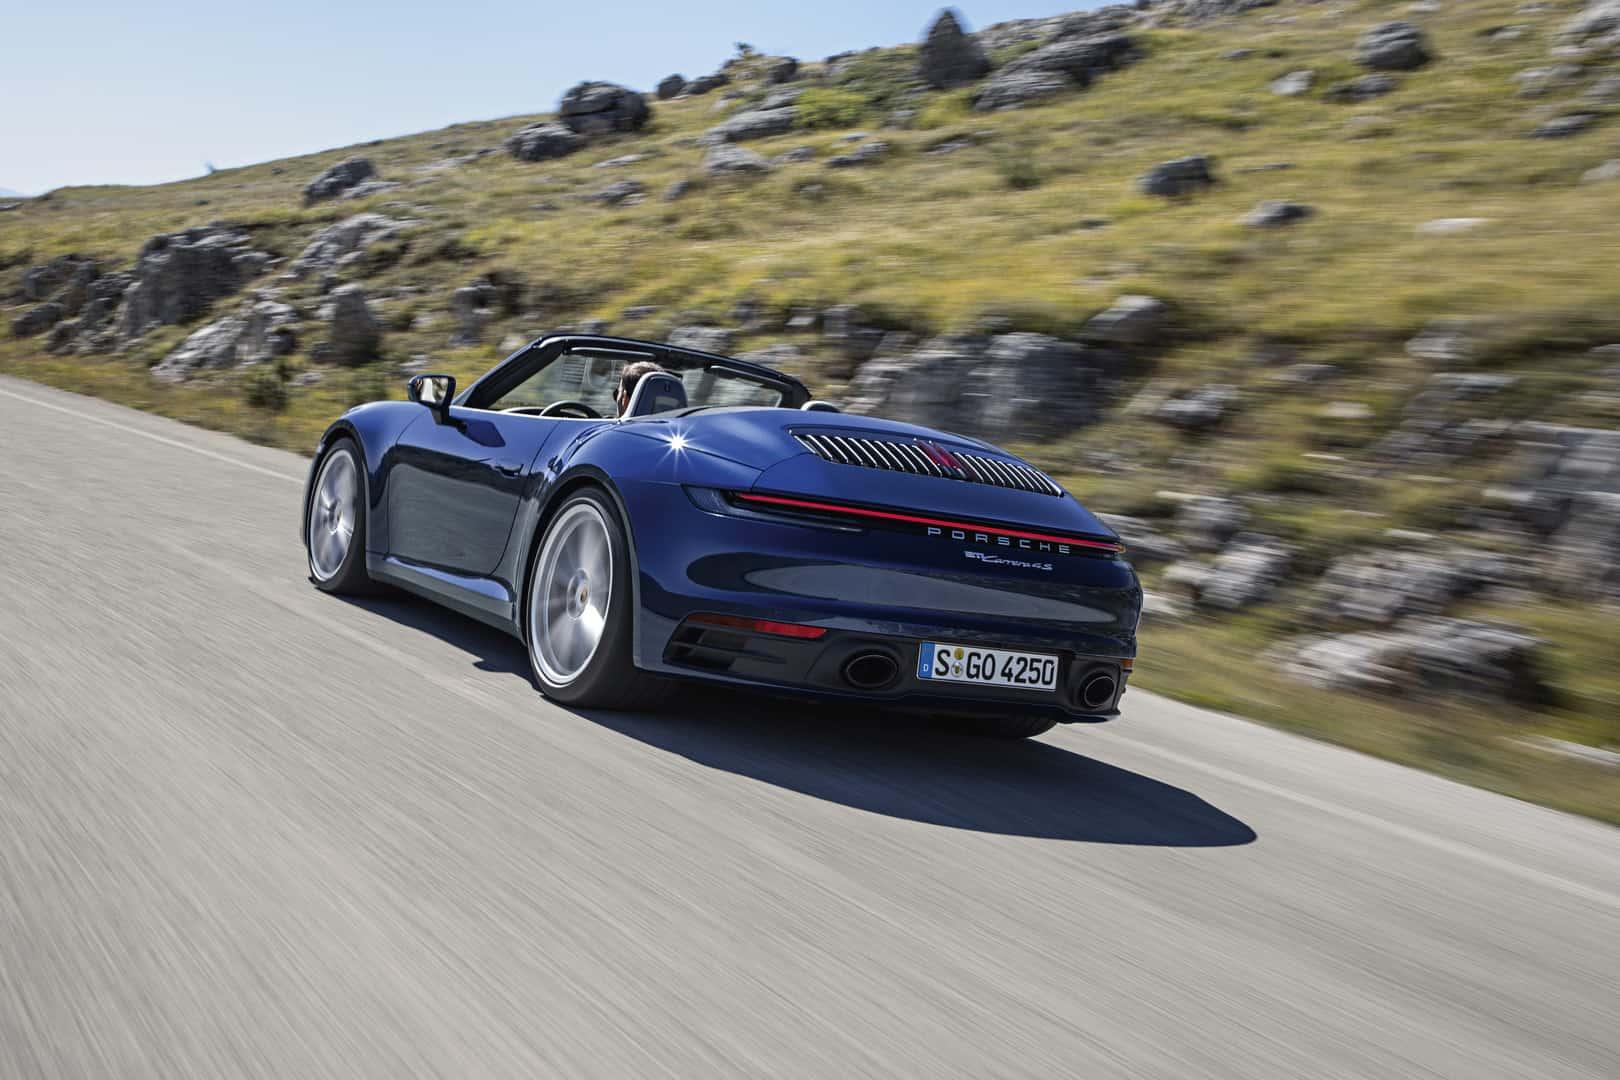 Porsche-911-Cabriolet-5